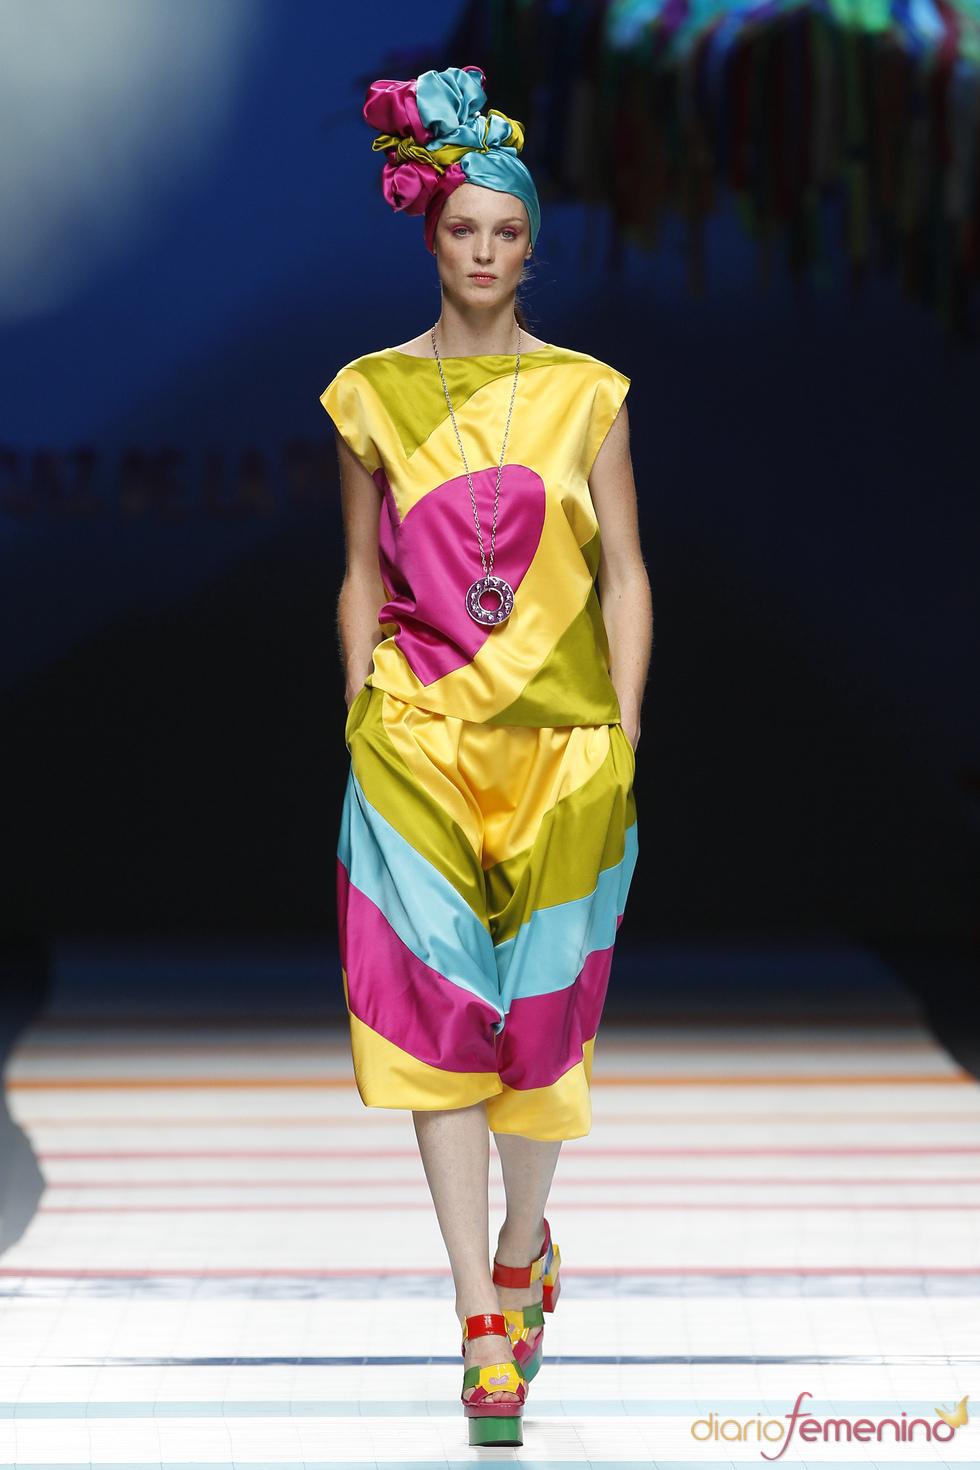 Cibeles Madrid Fashion Week con Ágatha Ruiz de la Prada